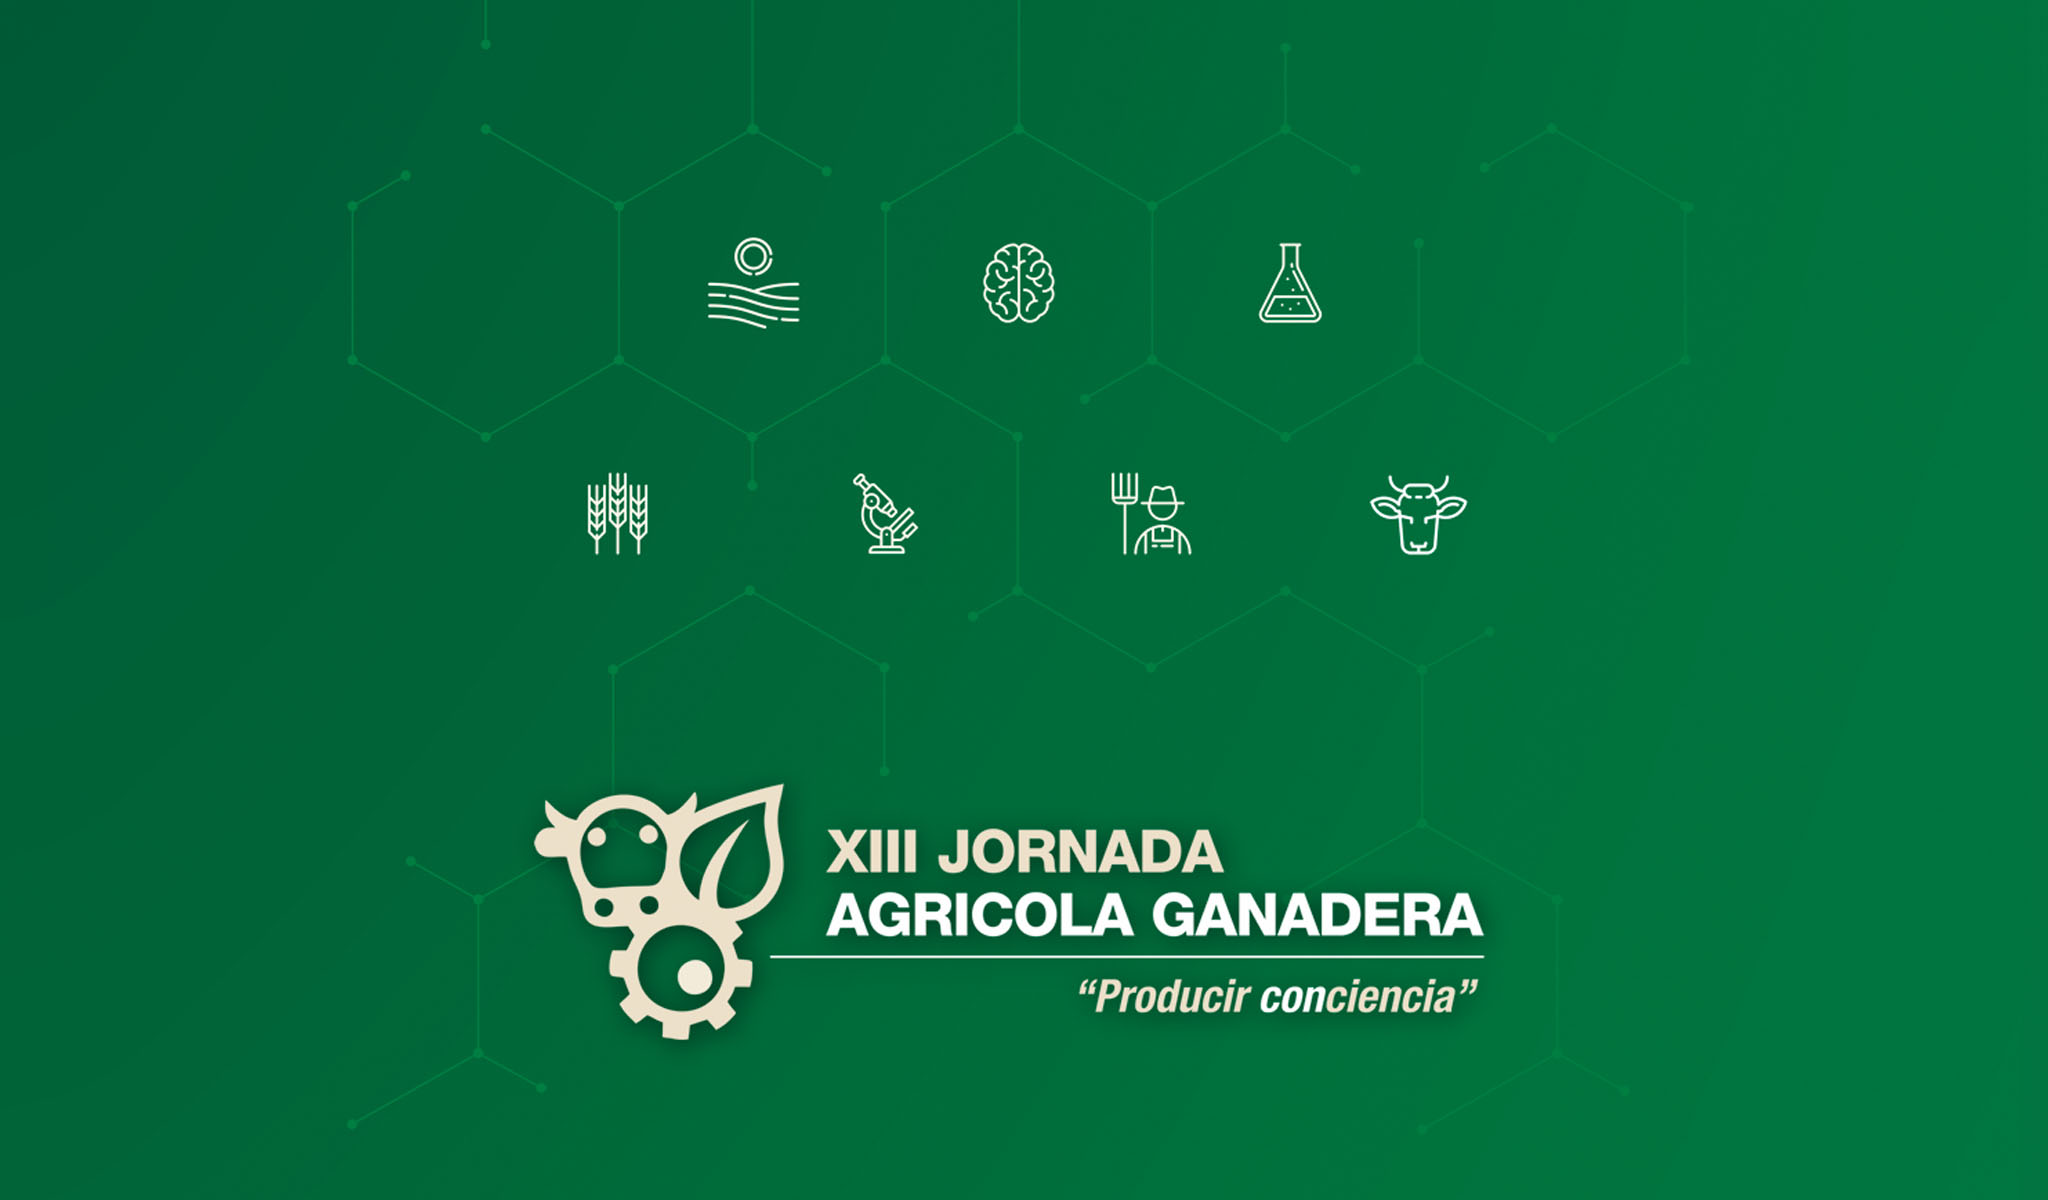 XIII Jornada Agrícola Ganadera